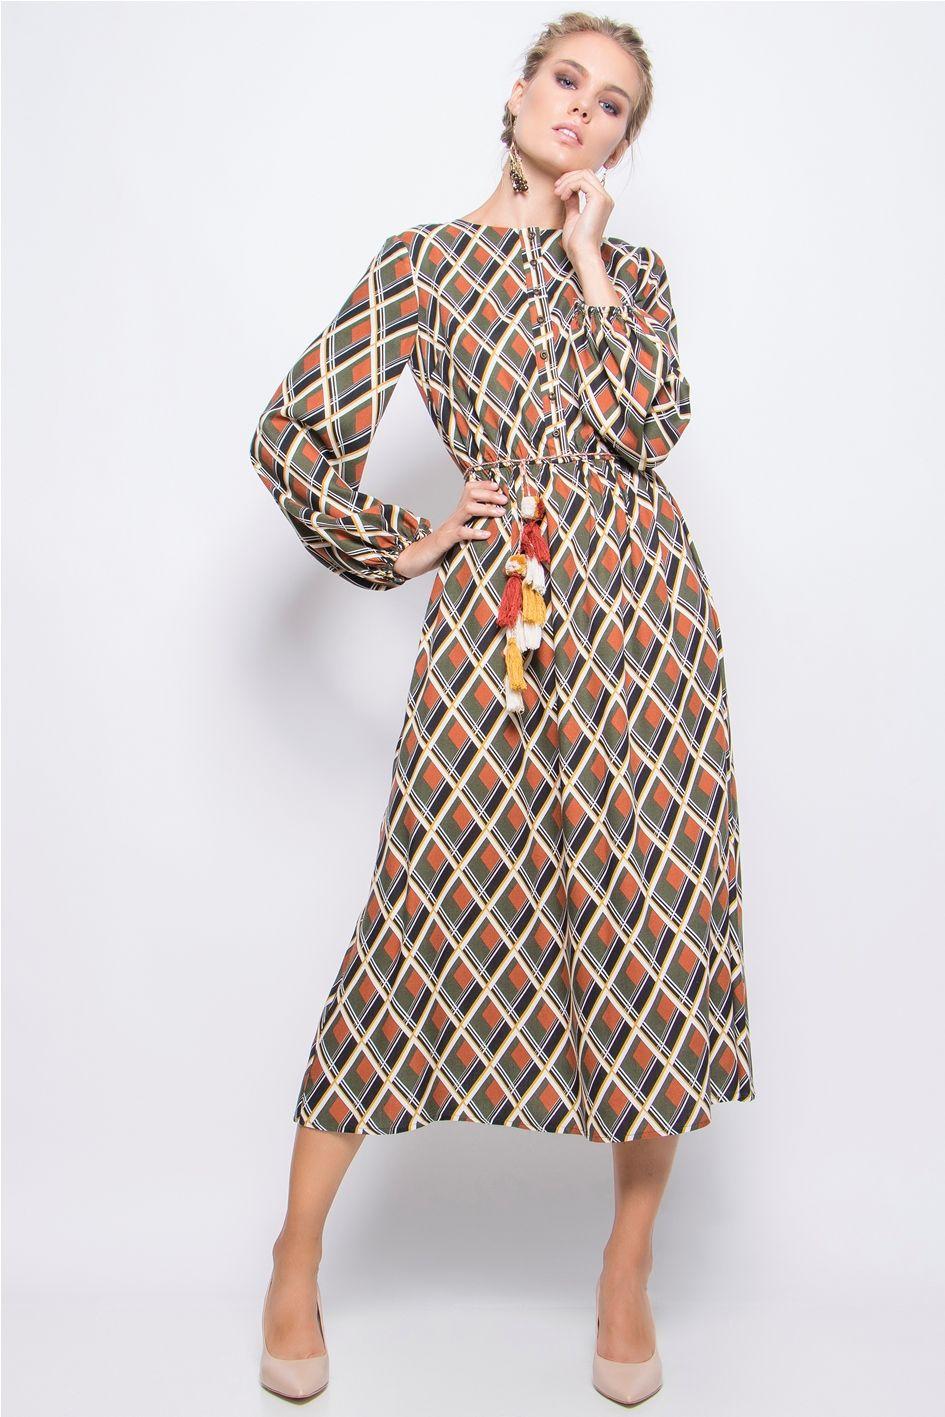 2f2d1c61dd96 Φόρεμα Maxi Εμπριμέ  λαιμόκοψη Μακρύ μανίκι μήκος έως την γάμπα ίσια γραμμή  Υπέροχη Μαλακή Υφη